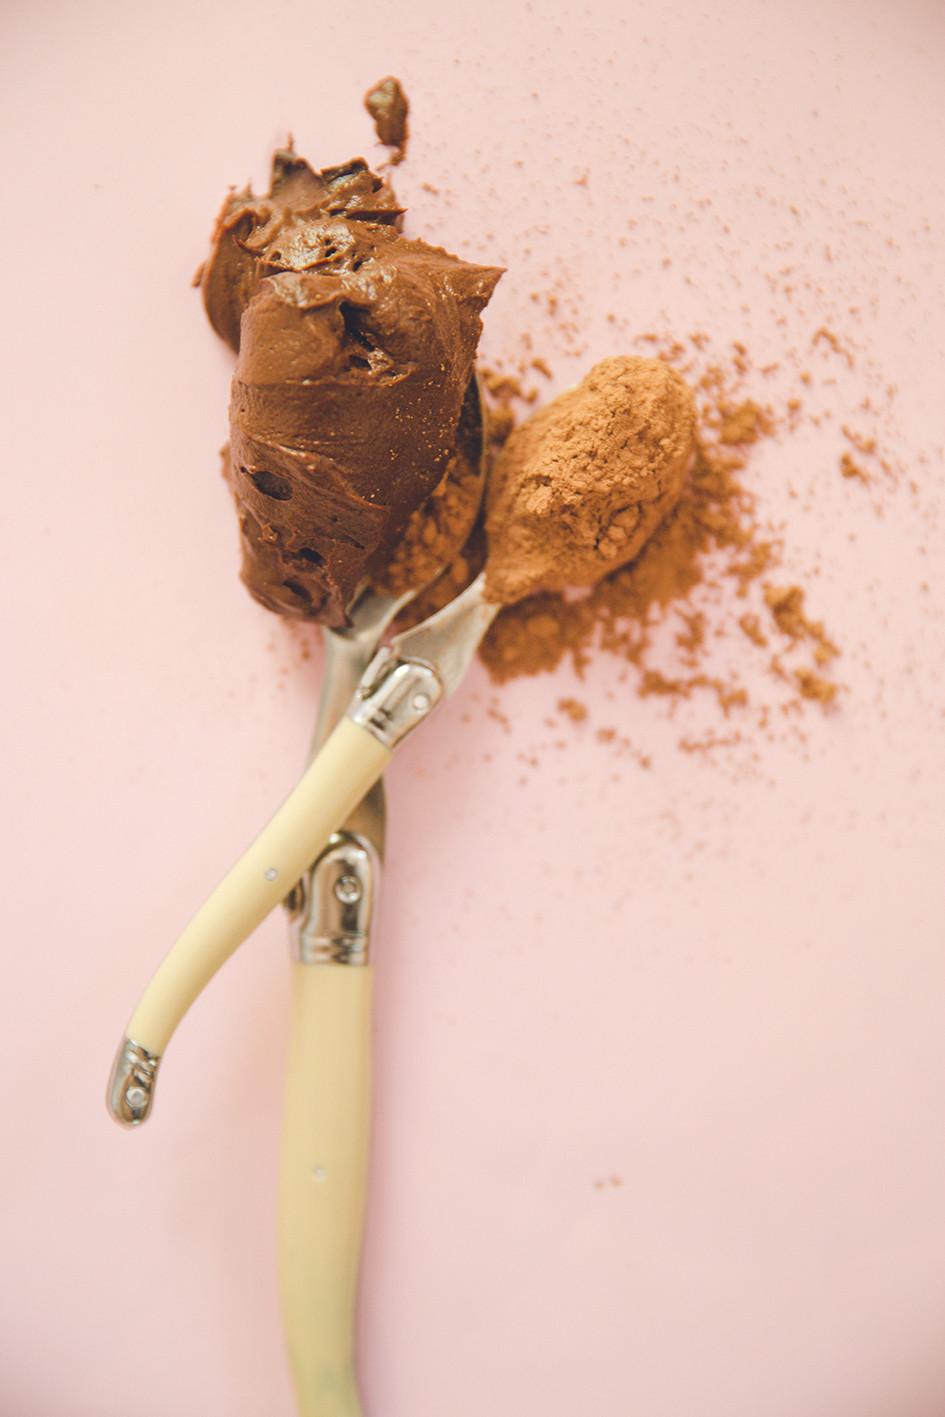 Super Easy, No Refined Sugar, Dairy Free, Gluten Free, Vegan, Paleo, Healthy, Homemade, Basic Raw Chocolate Recipe